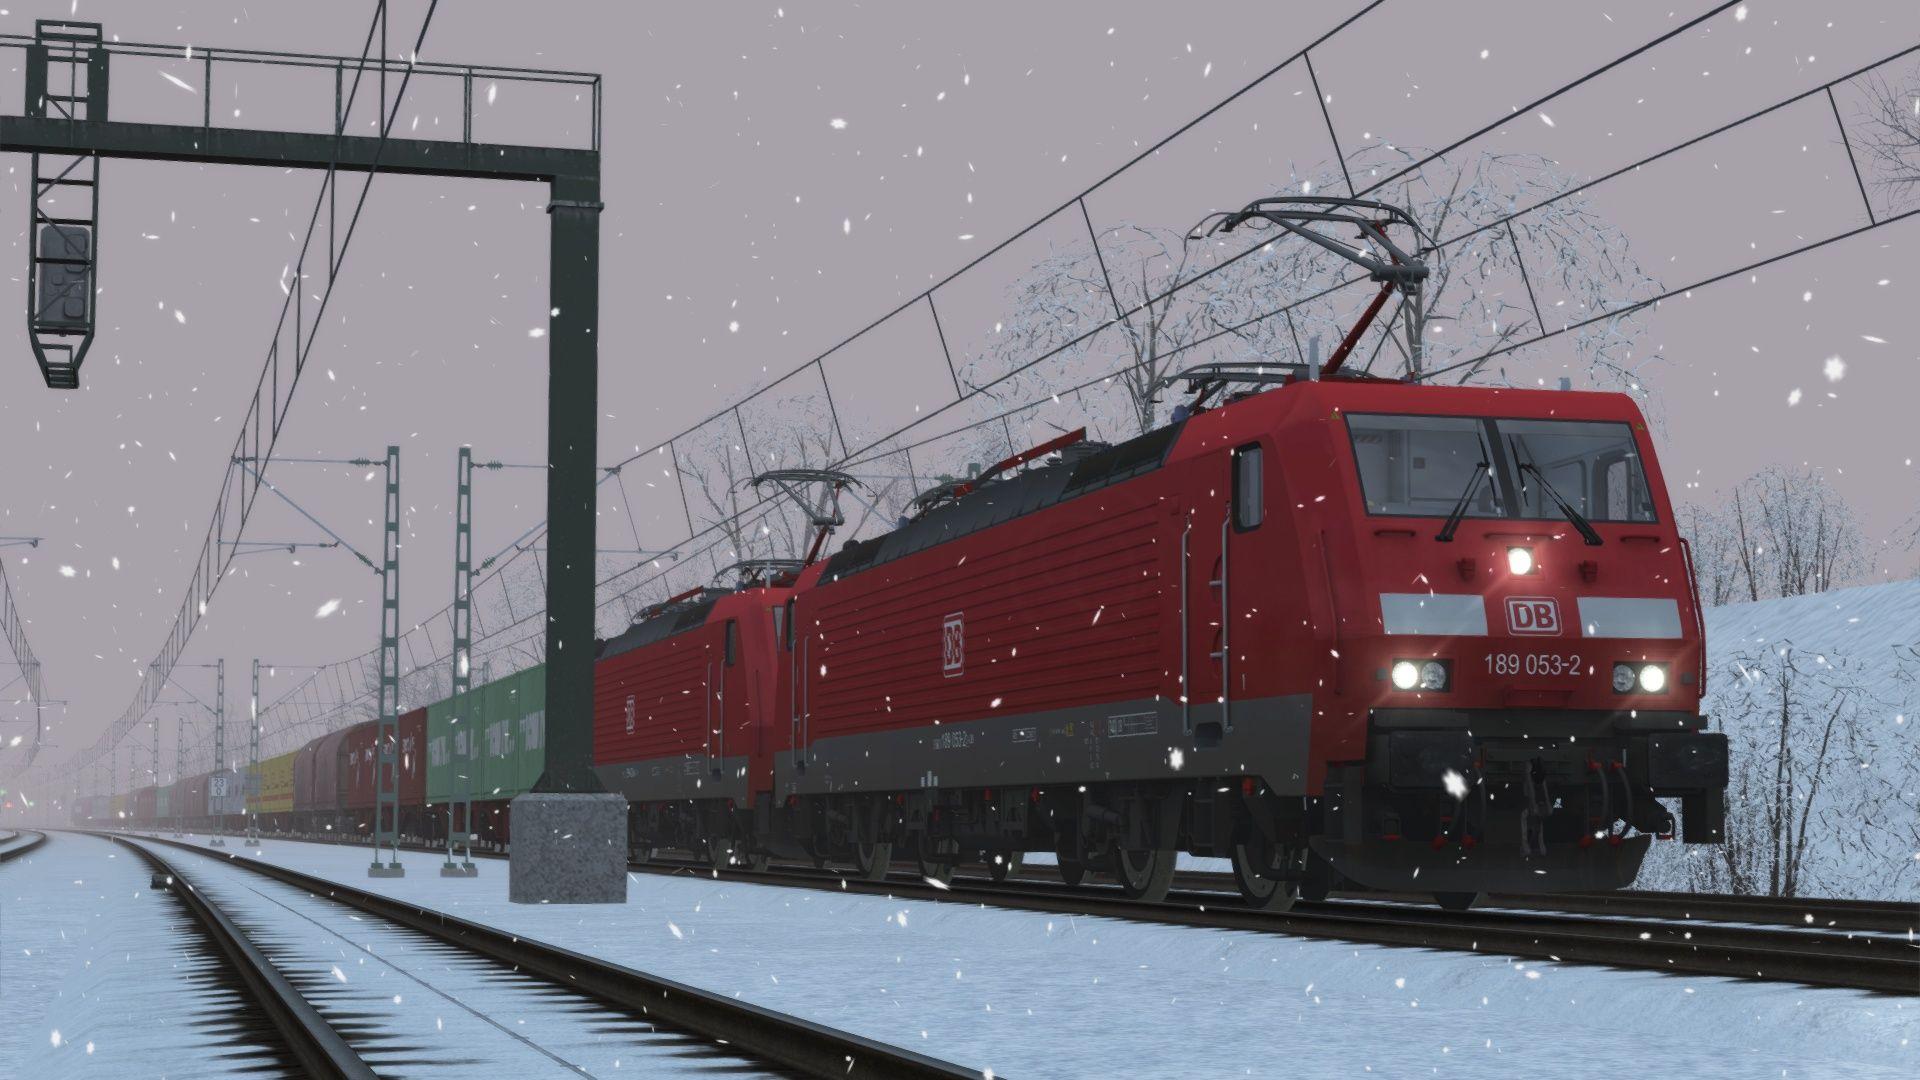 TS20197